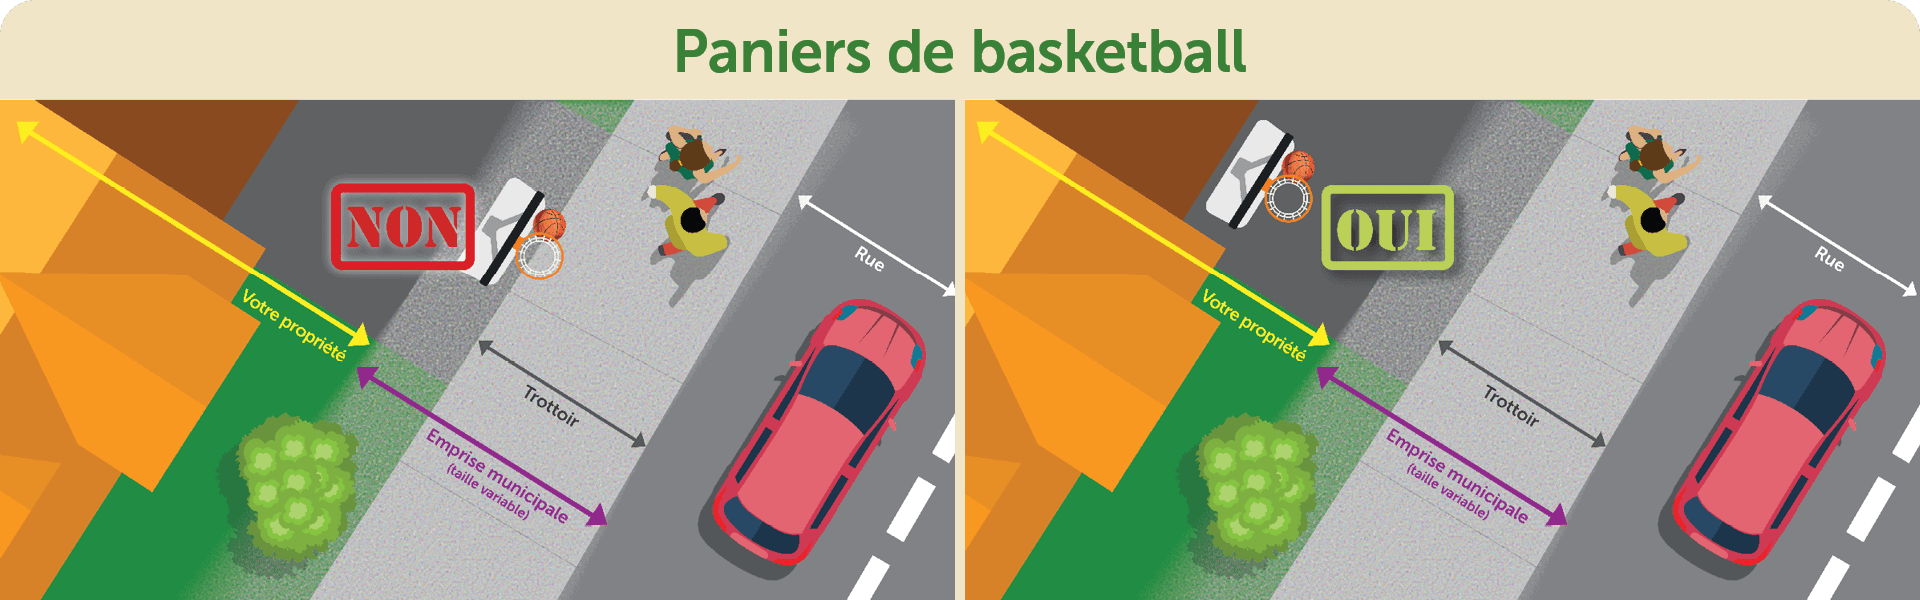 Paniers de basketball